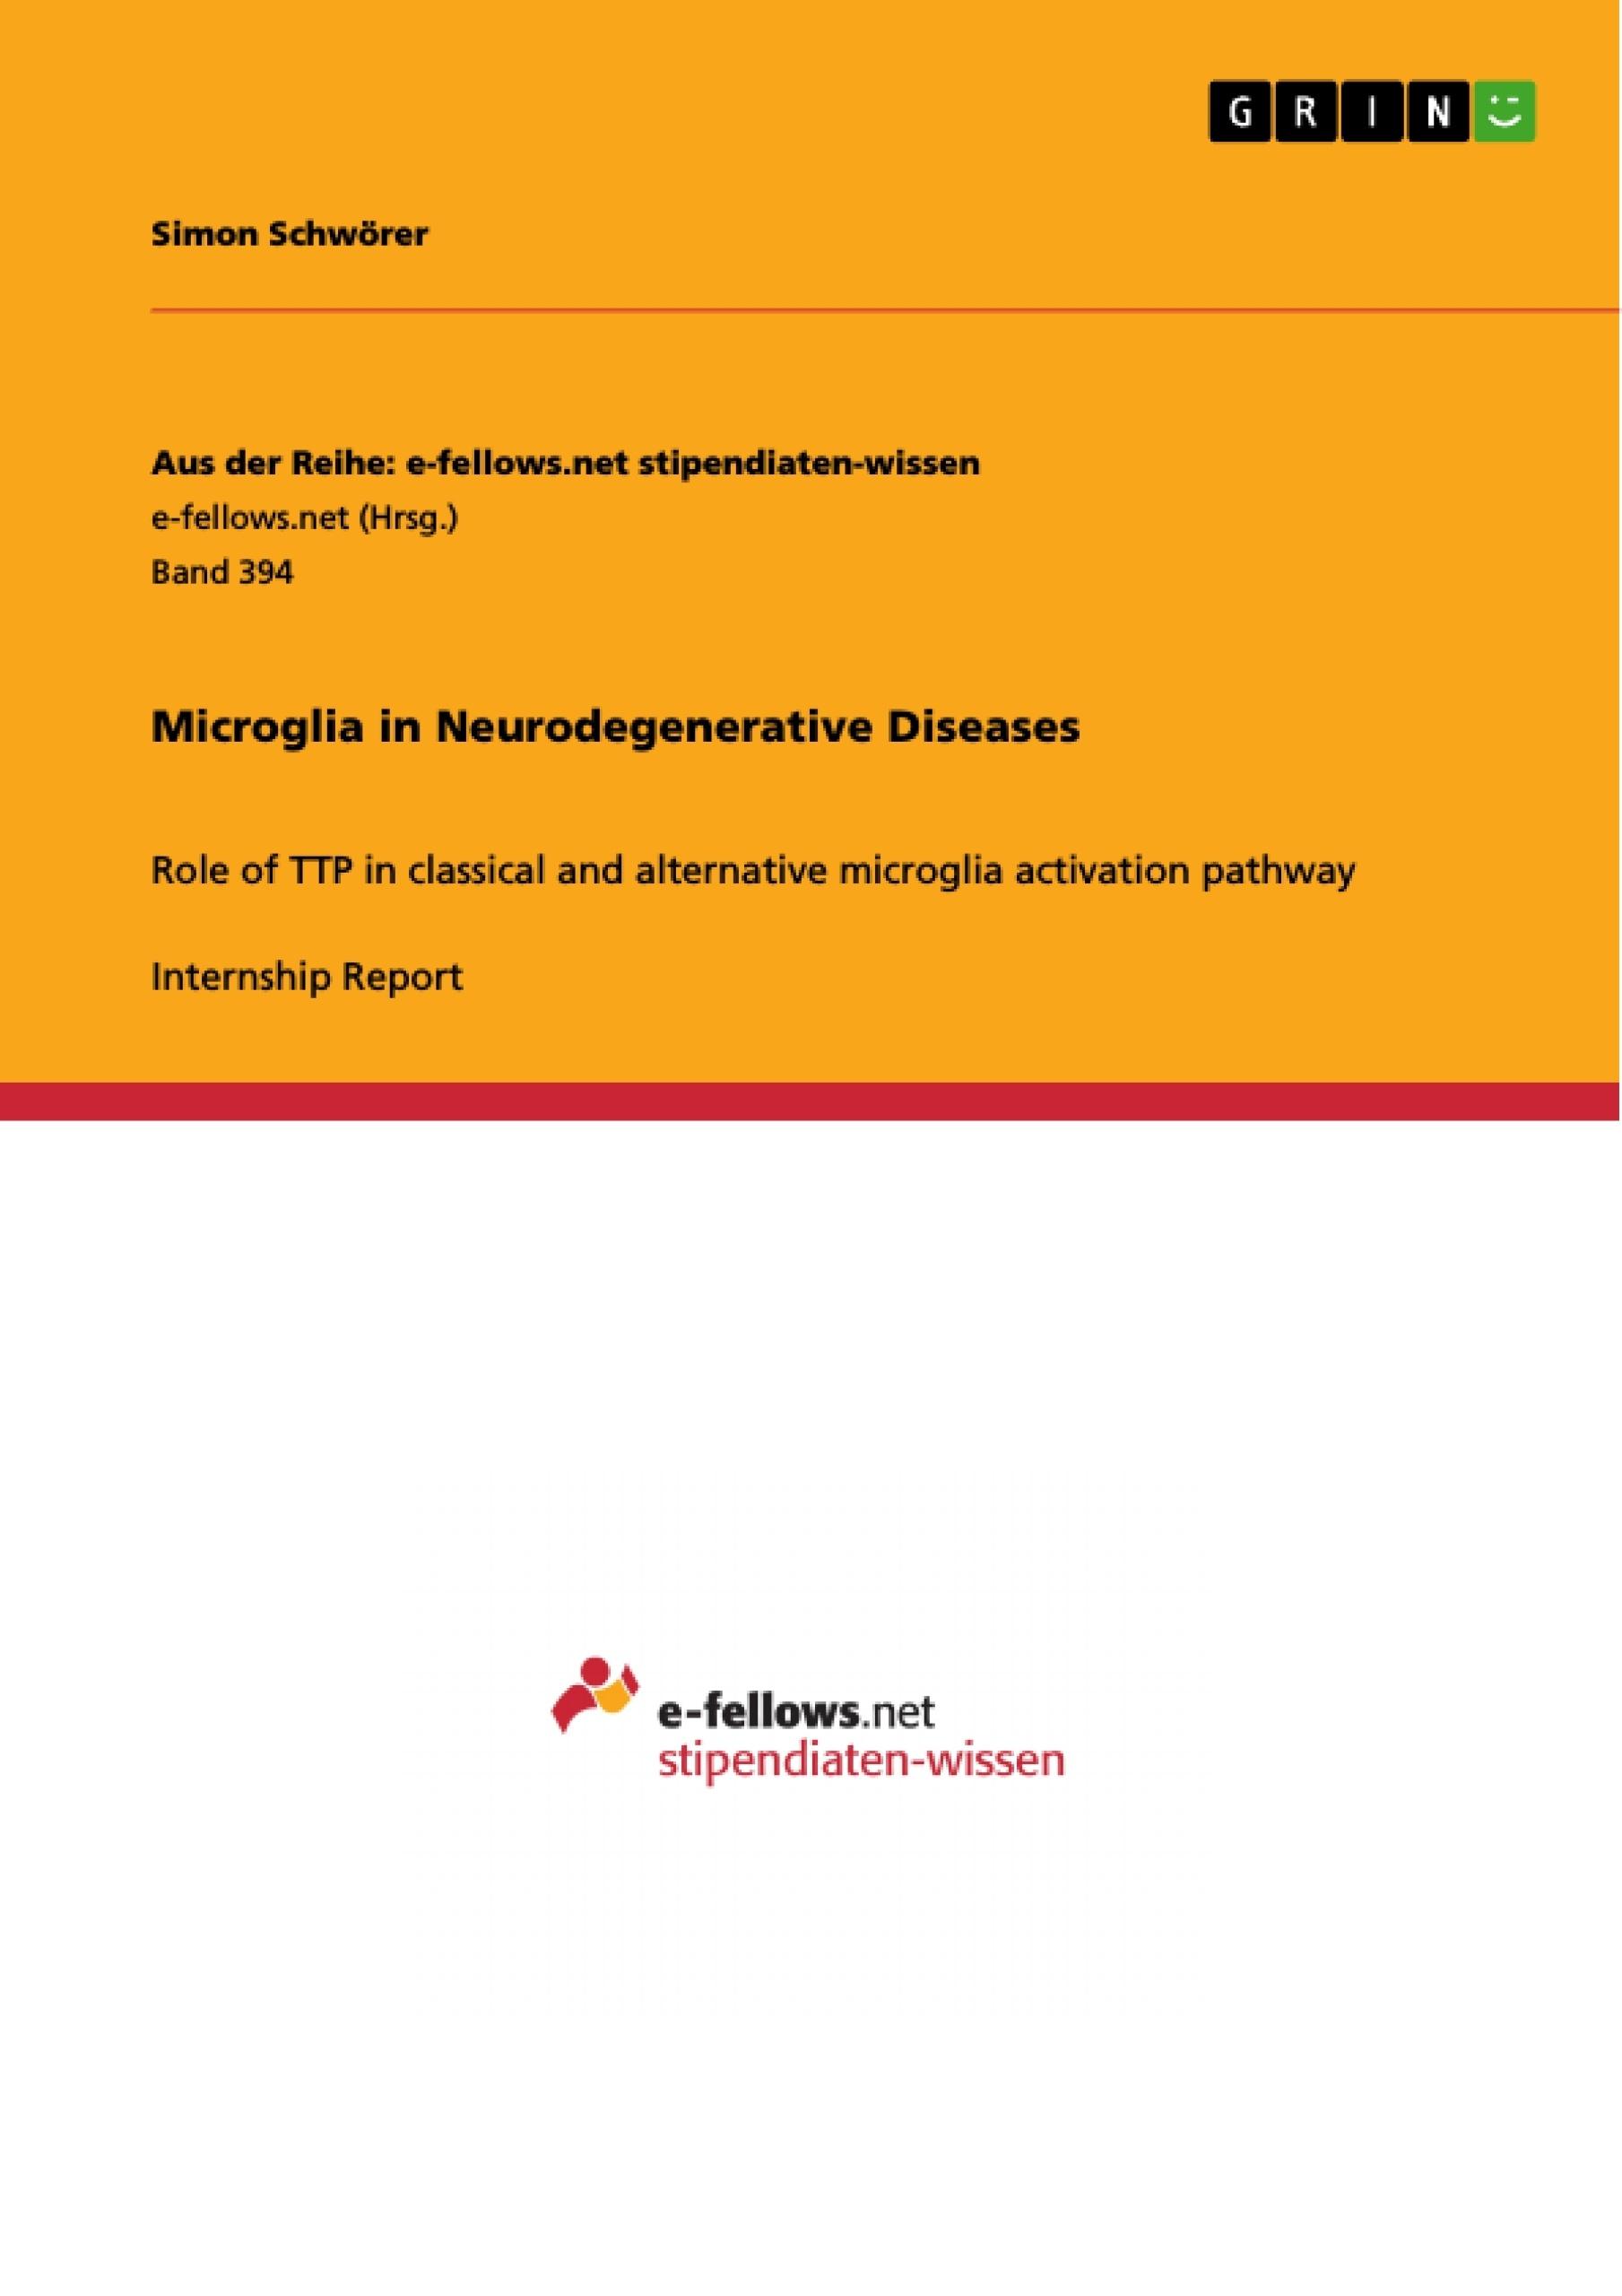 Title: Microglia in Neurodegenerative Diseases